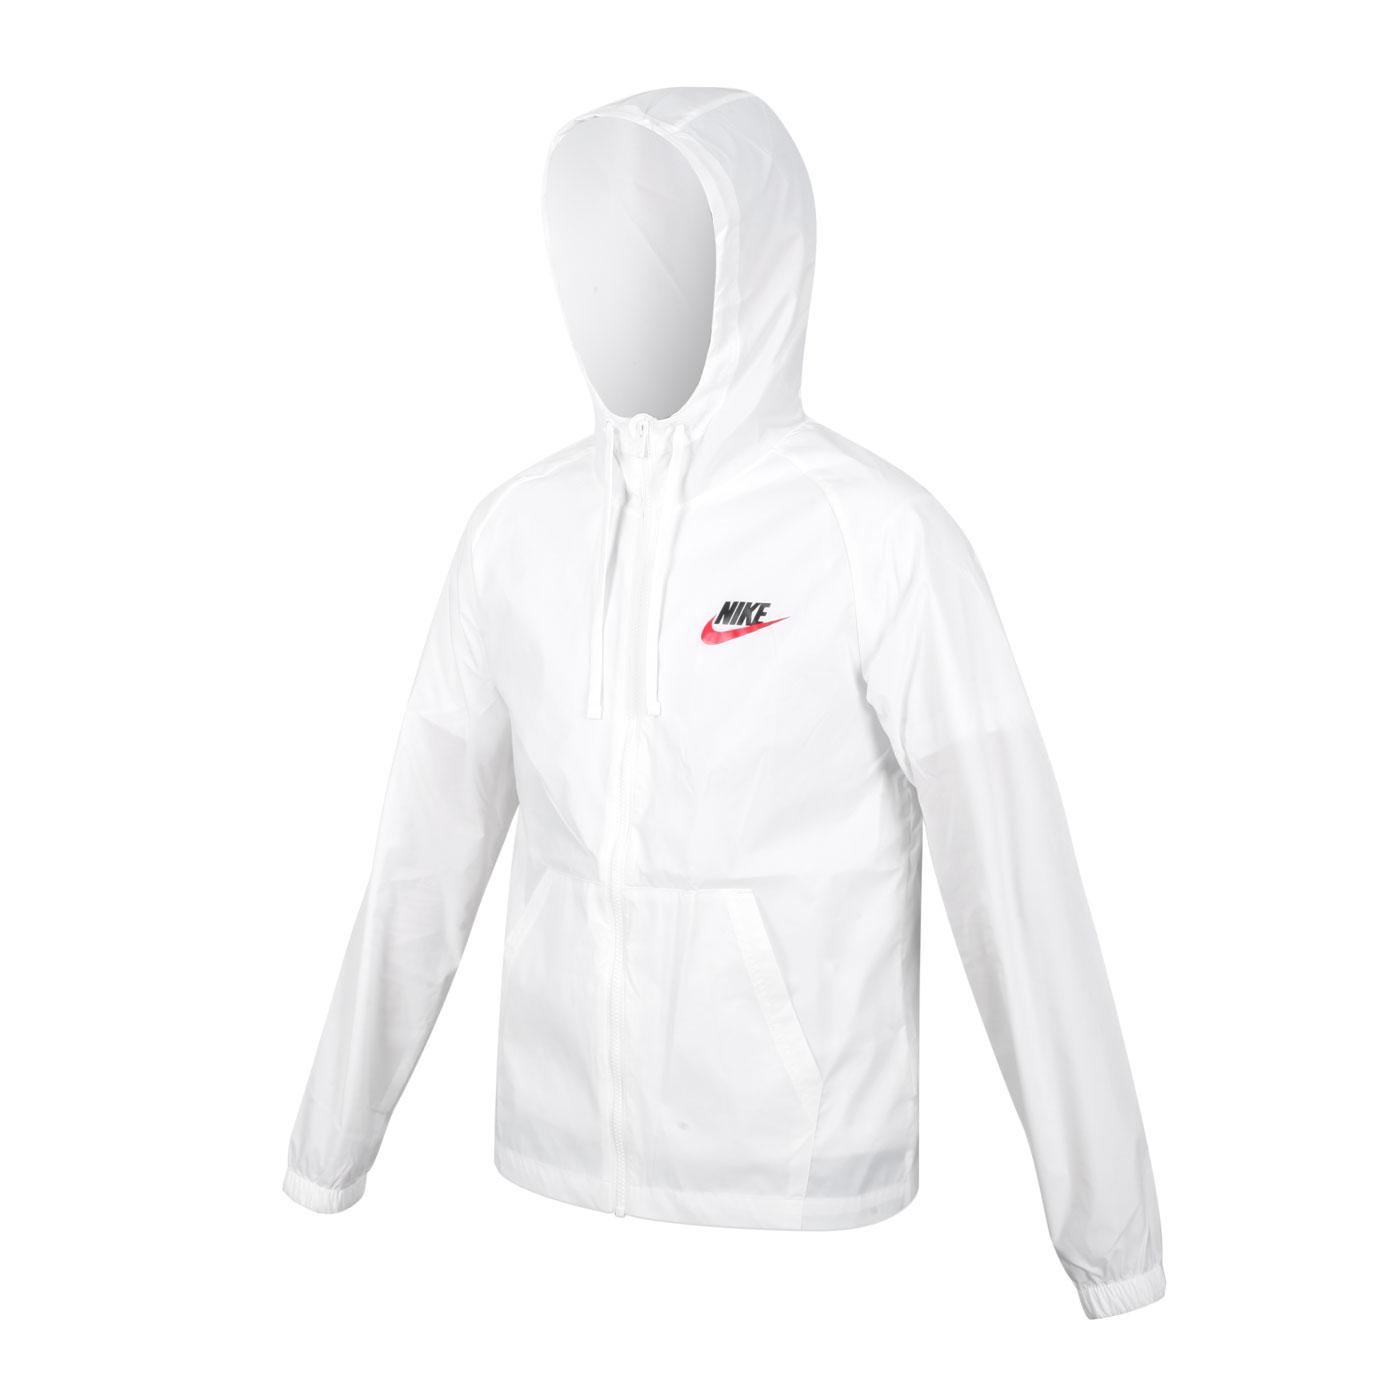 NIKE 男款防風連帽外套 CZ8677-100 - 白黑紅